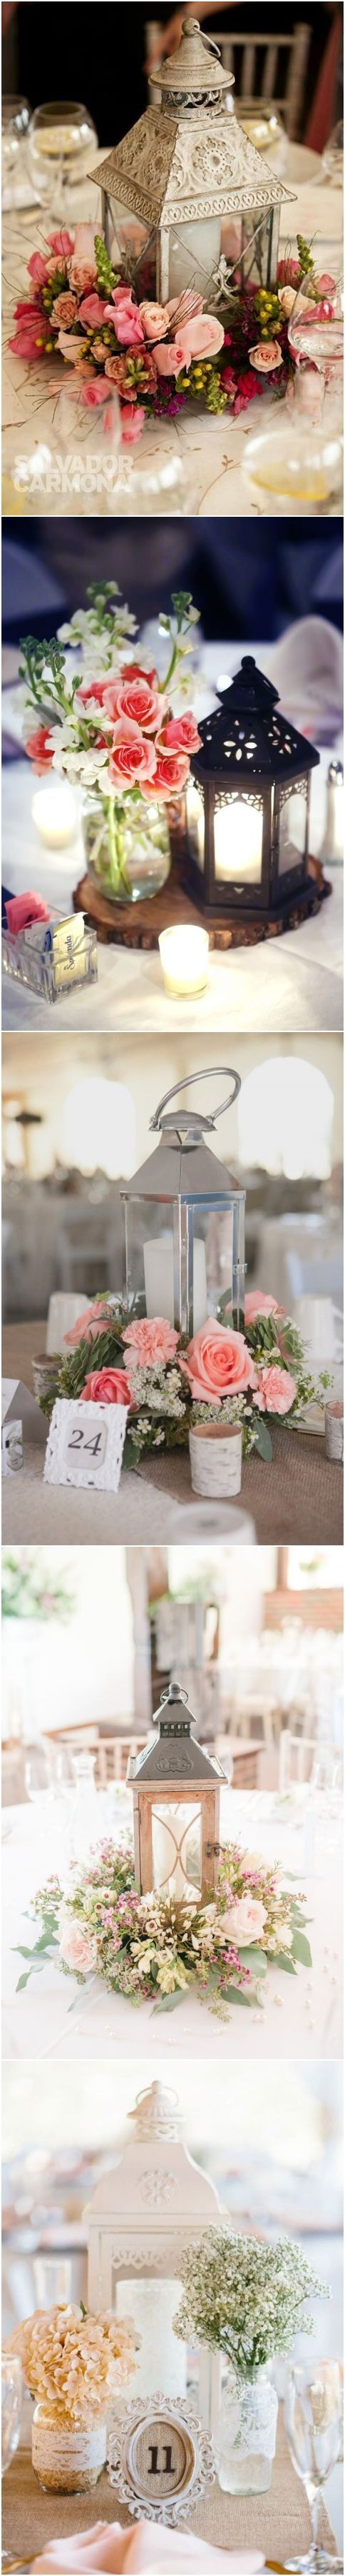 rustic latern wedding centerpieces / http://www.deerpearlflowers.com/wedding-centerpiece-ideas/ #rusticbeddingideas